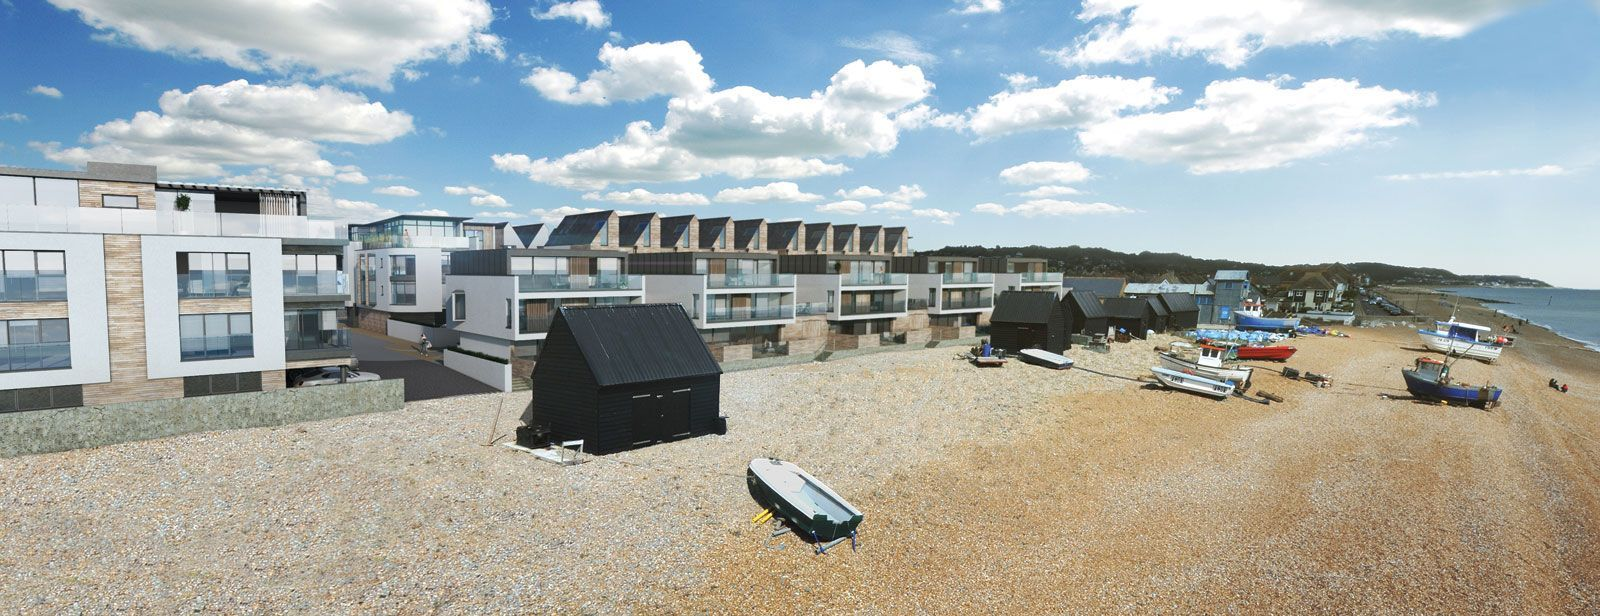 Fishermans Beach, Hythe, Range Road Villas Development